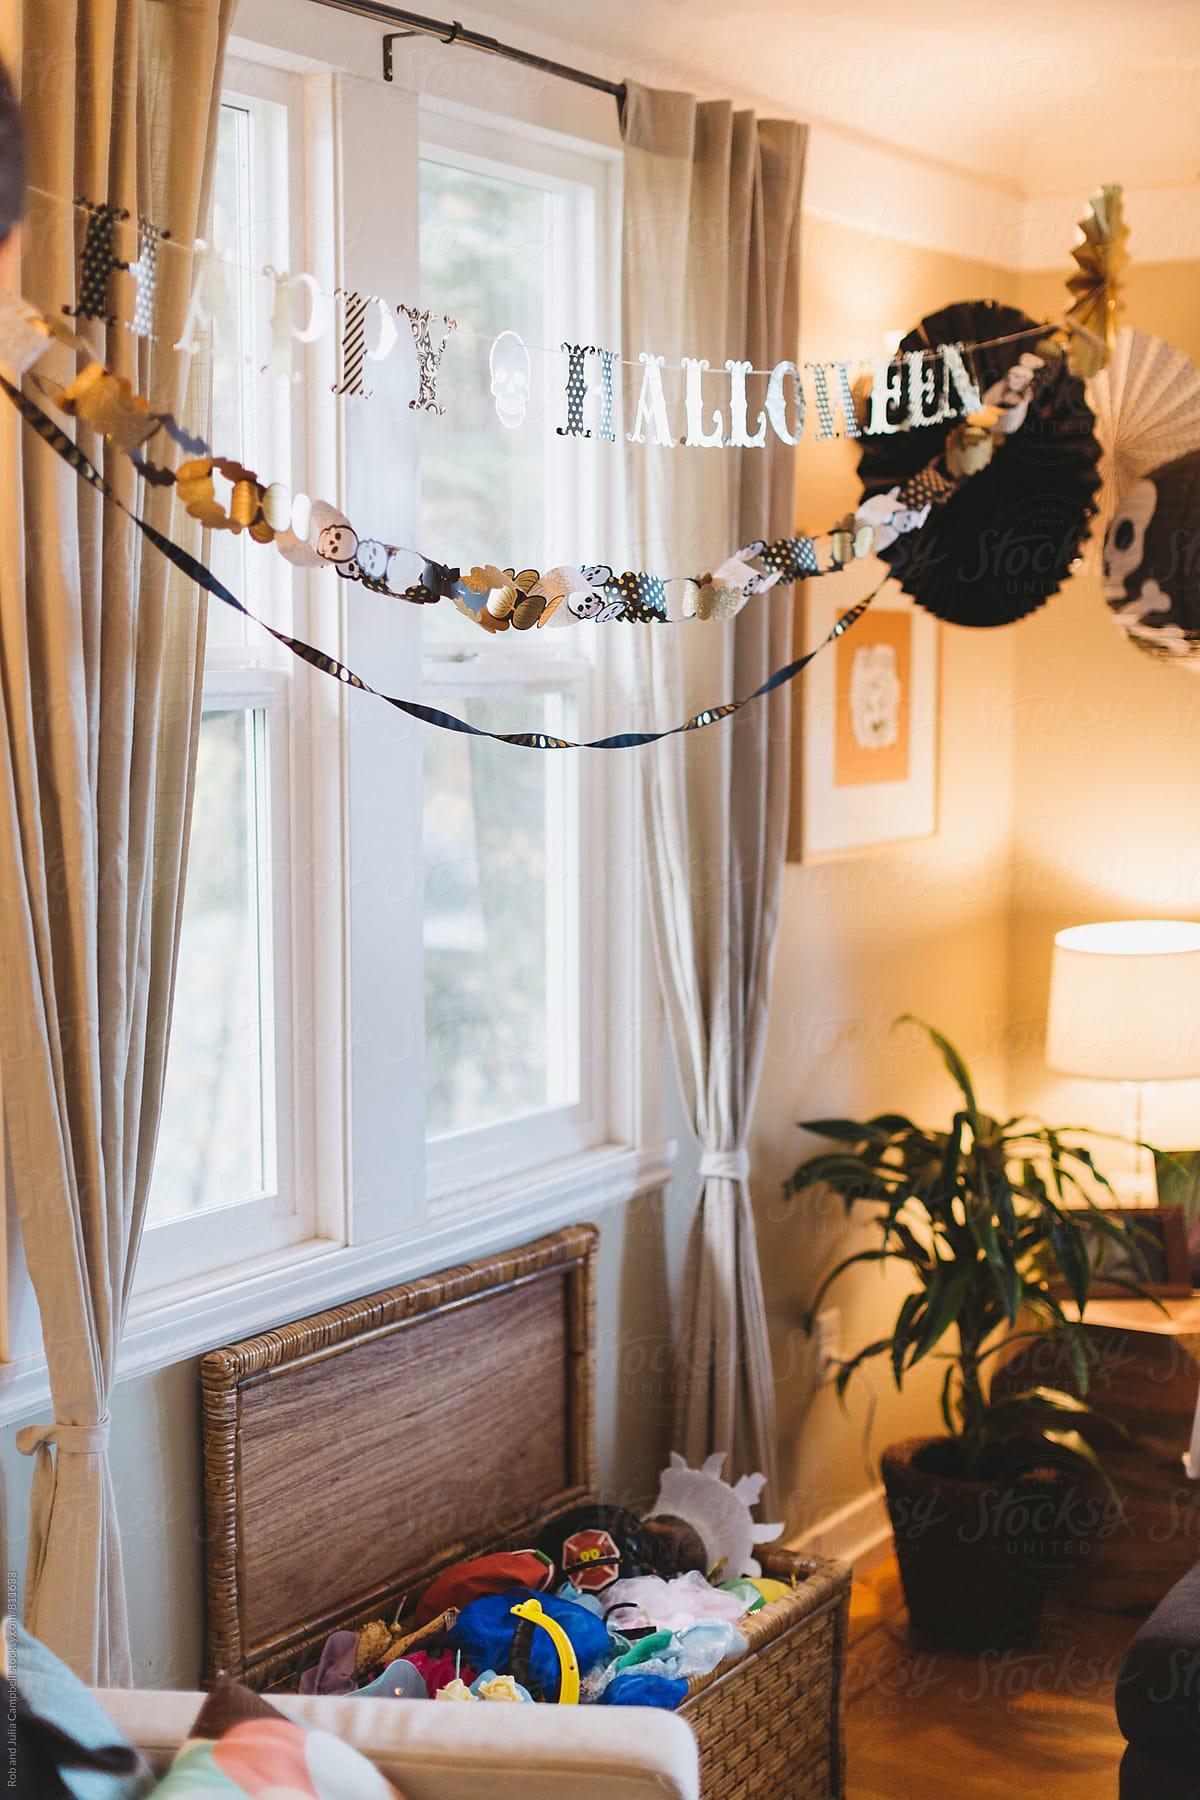 halloween decorations inside | stocksy united